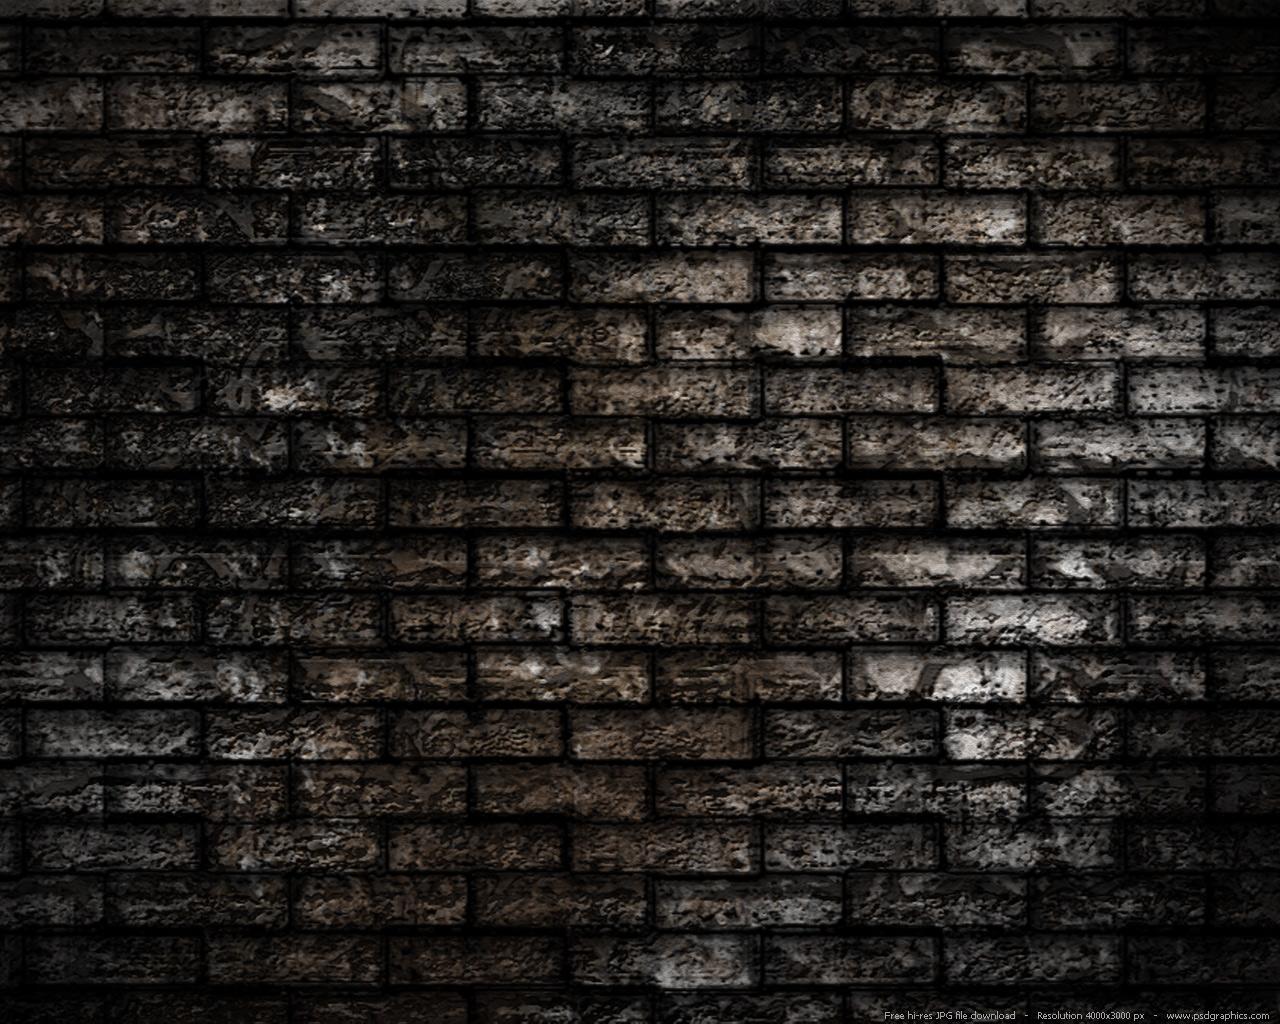 black brick wall, texture, bricks, brick wall texture, background, download, bricks